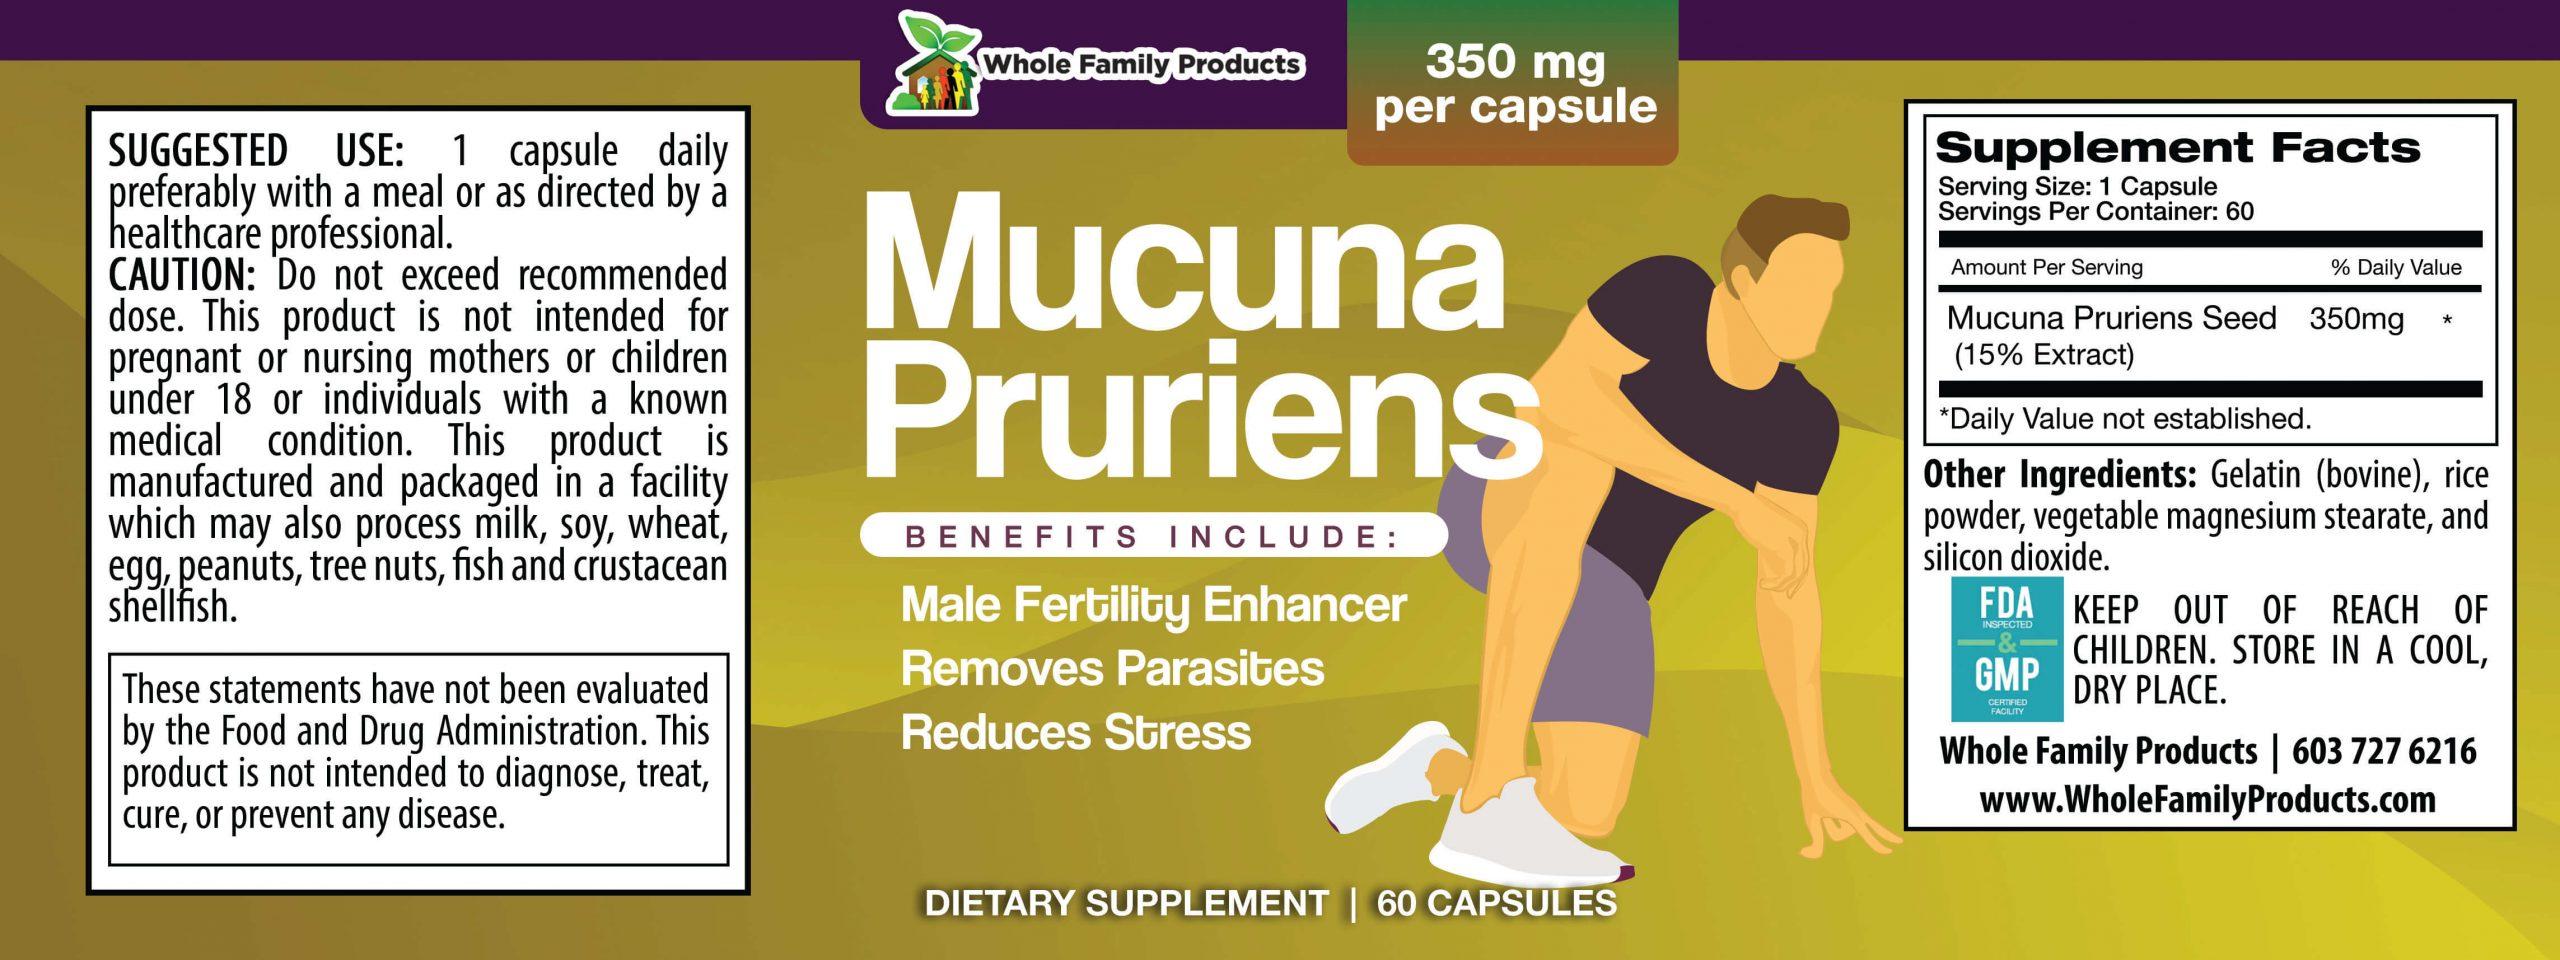 Mucuna Pruriens WFP Product Label